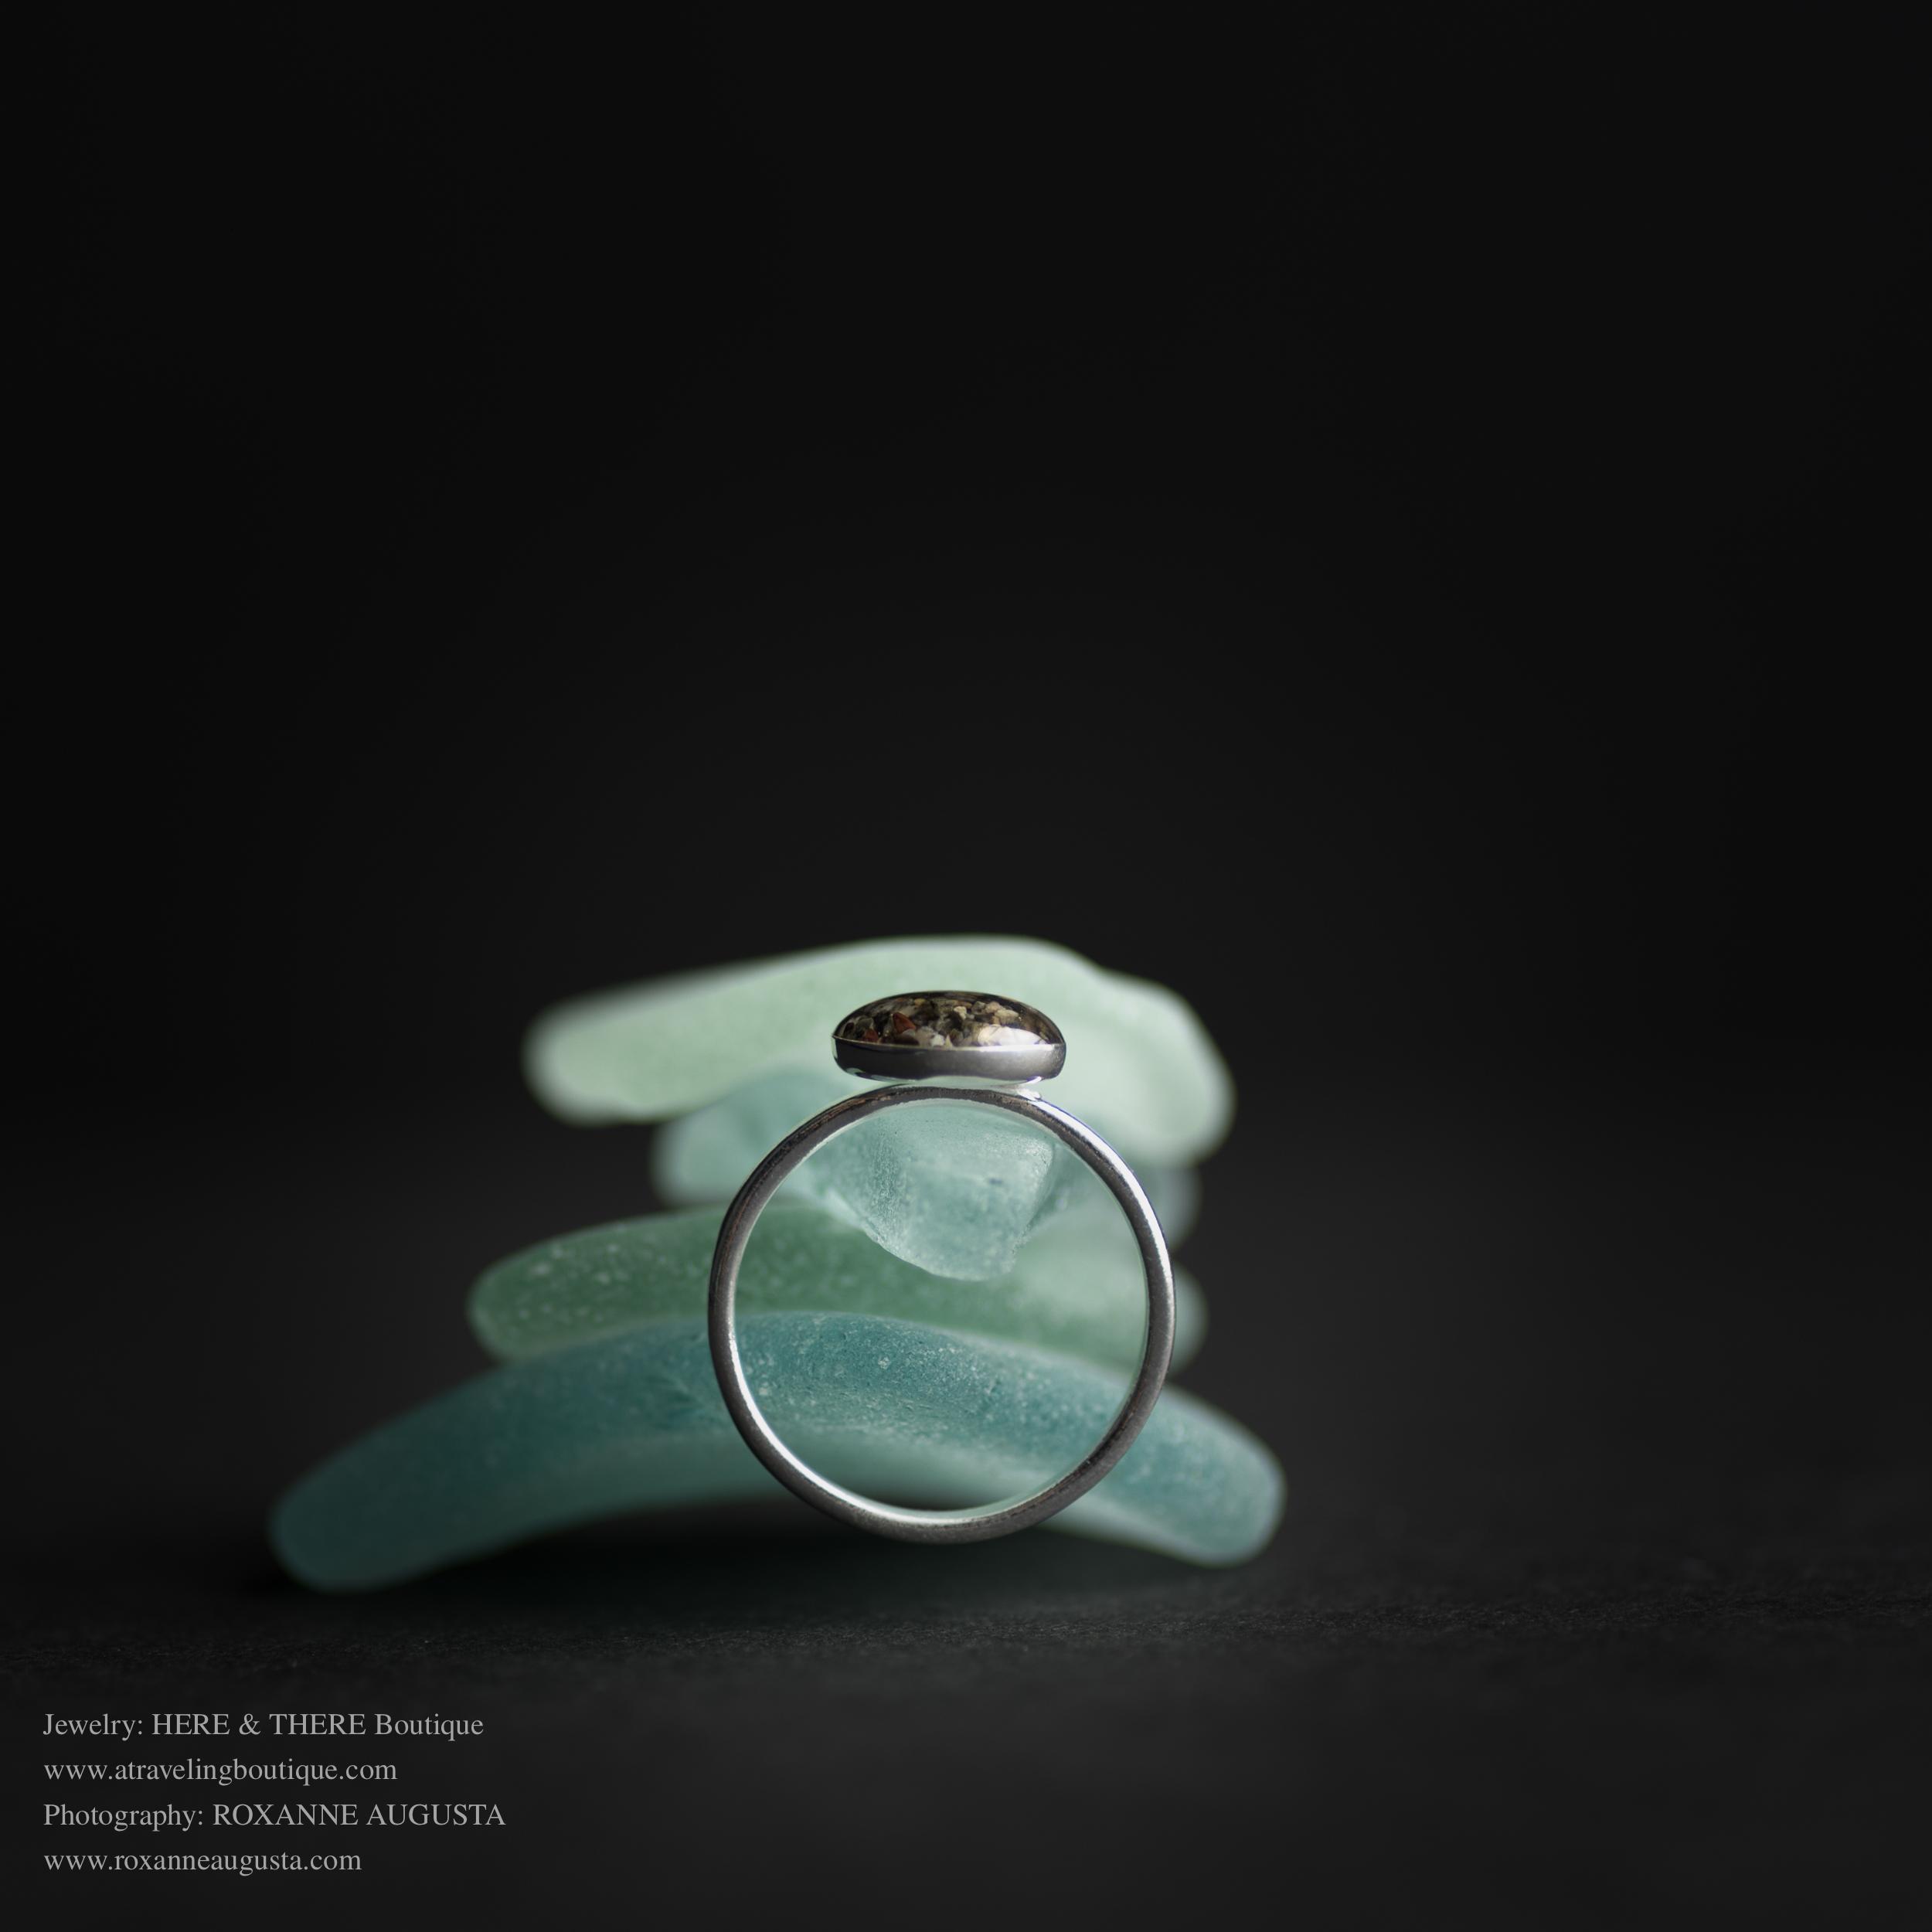 H&TJewelryProductPhotography-ROXANNEAUGUSTA-5.jpg